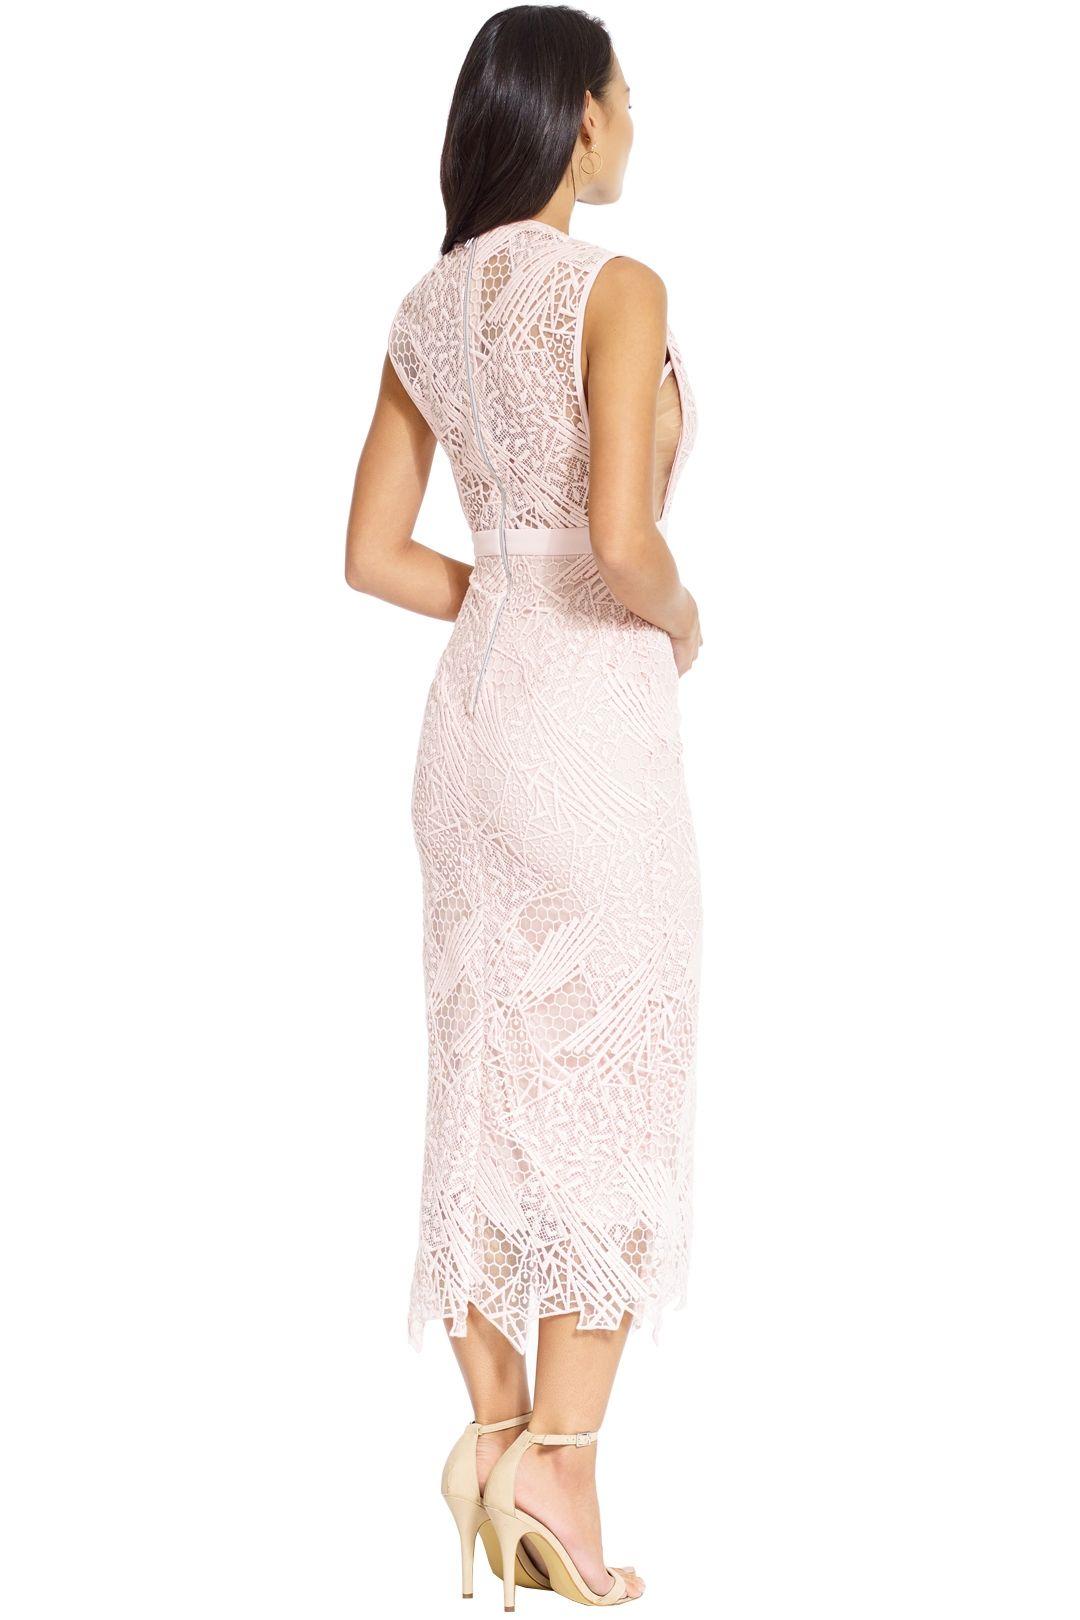 Manning Cartell - Gallery Views Sheath Dress - Blush - Back